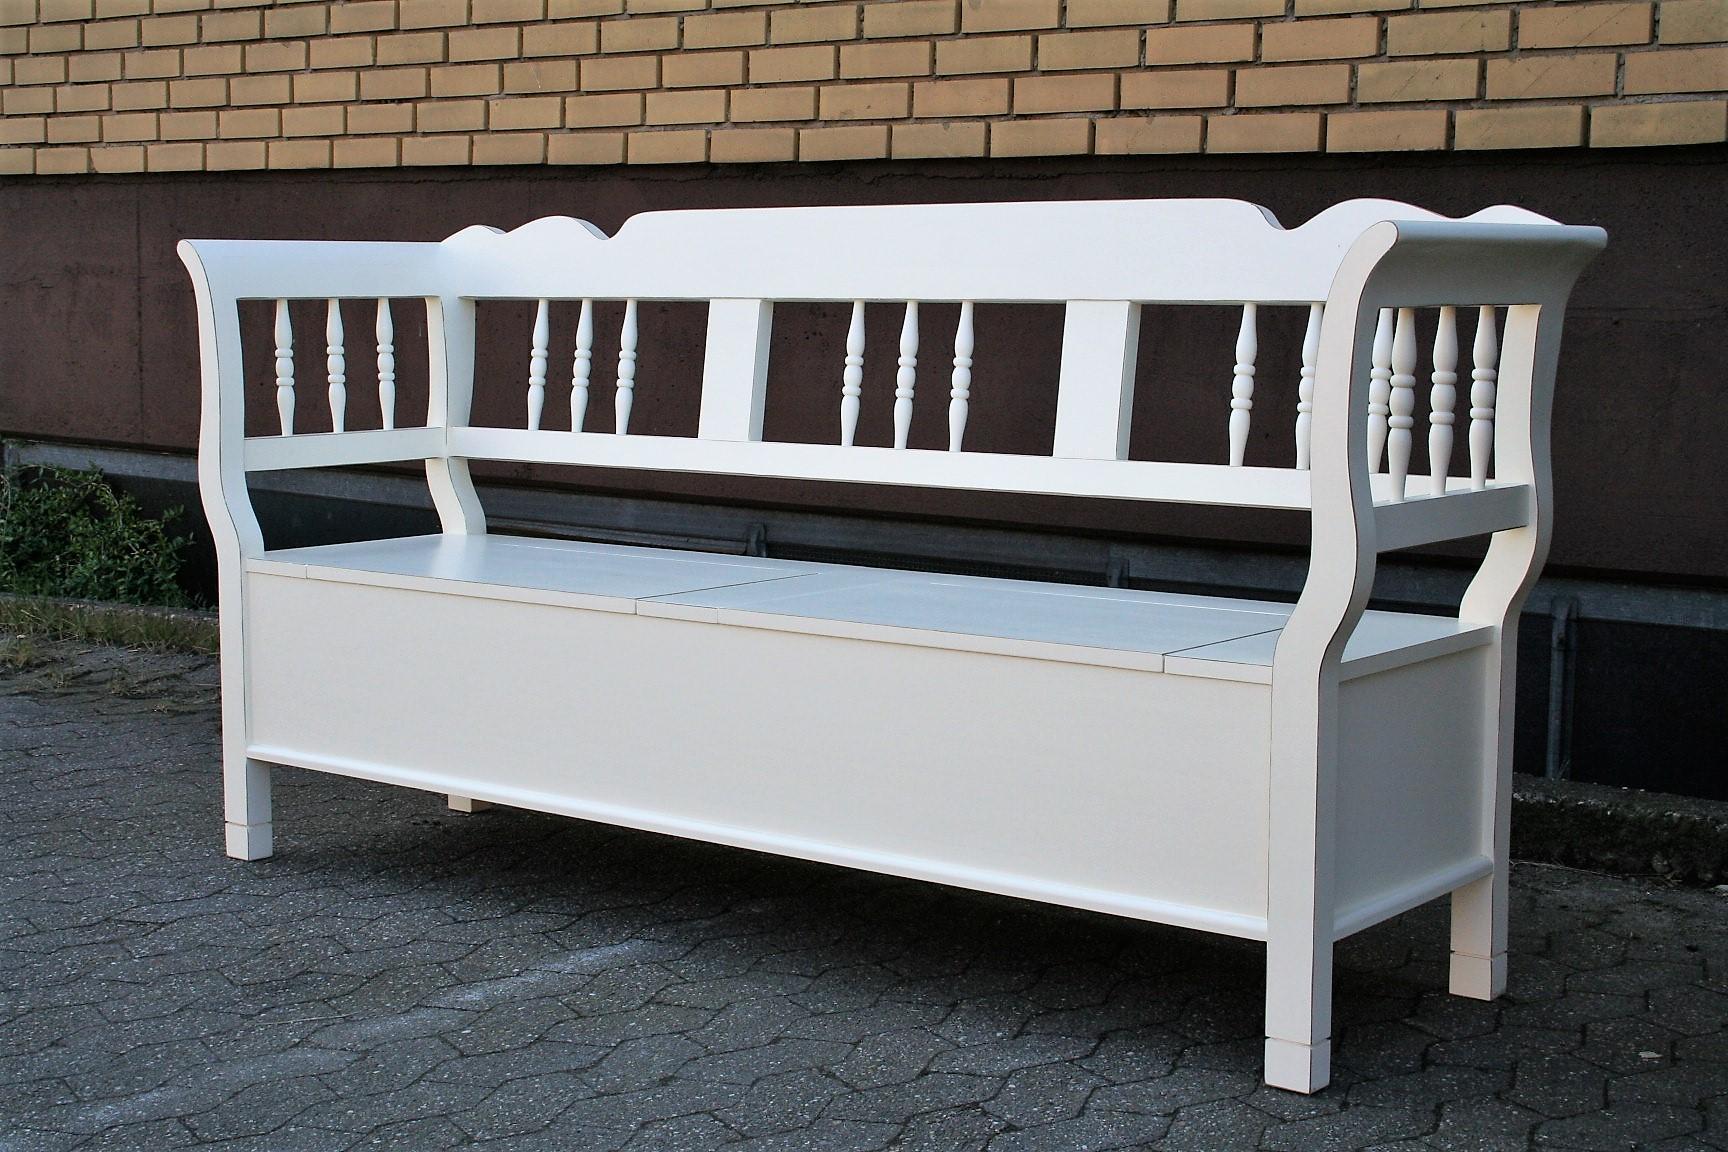 holzbnke fr innen heine home bank with holzbnke fr innen finest delife sitzbank liveedge x. Black Bedroom Furniture Sets. Home Design Ideas